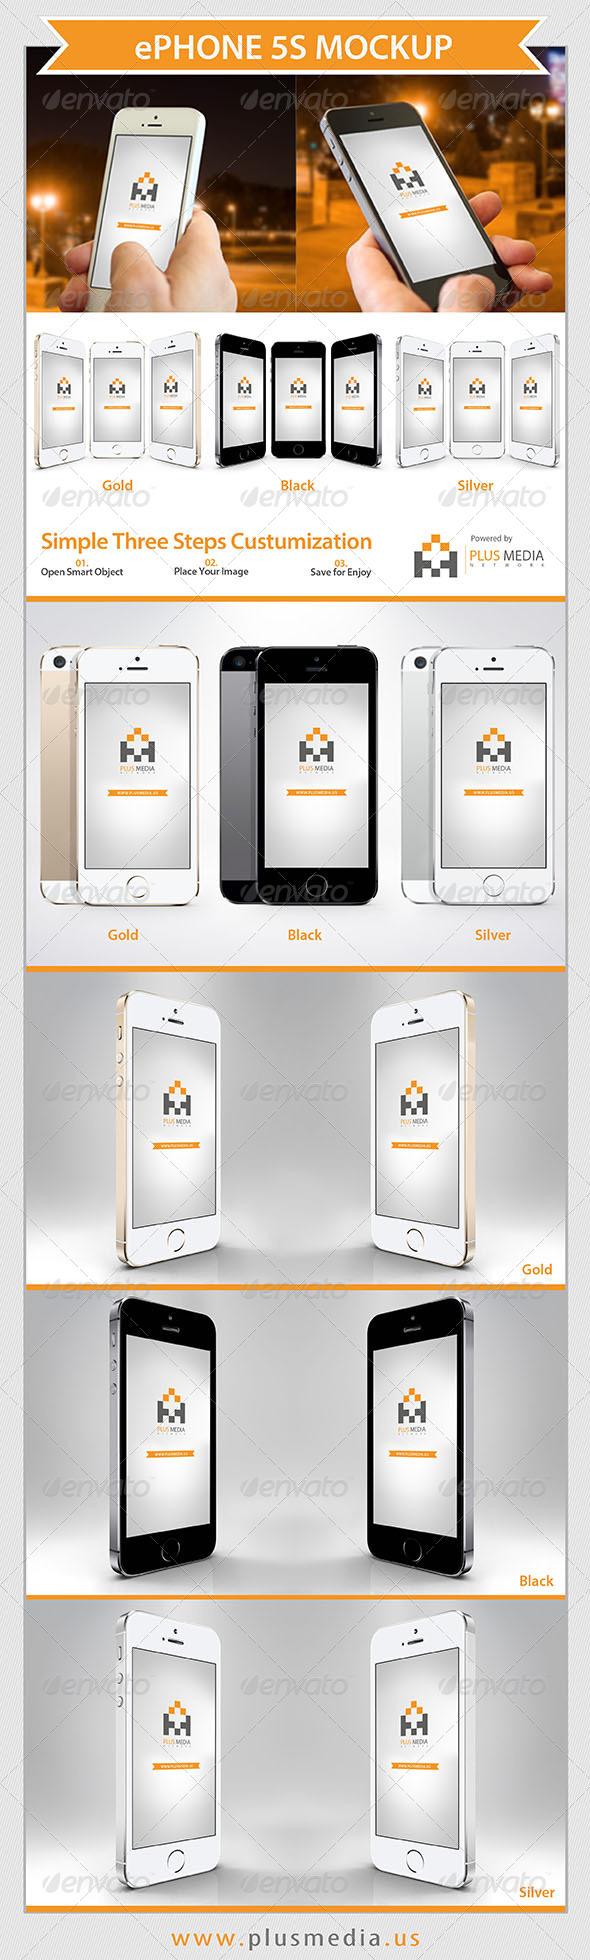 ePhone 5S Mockup - Mobile Displays